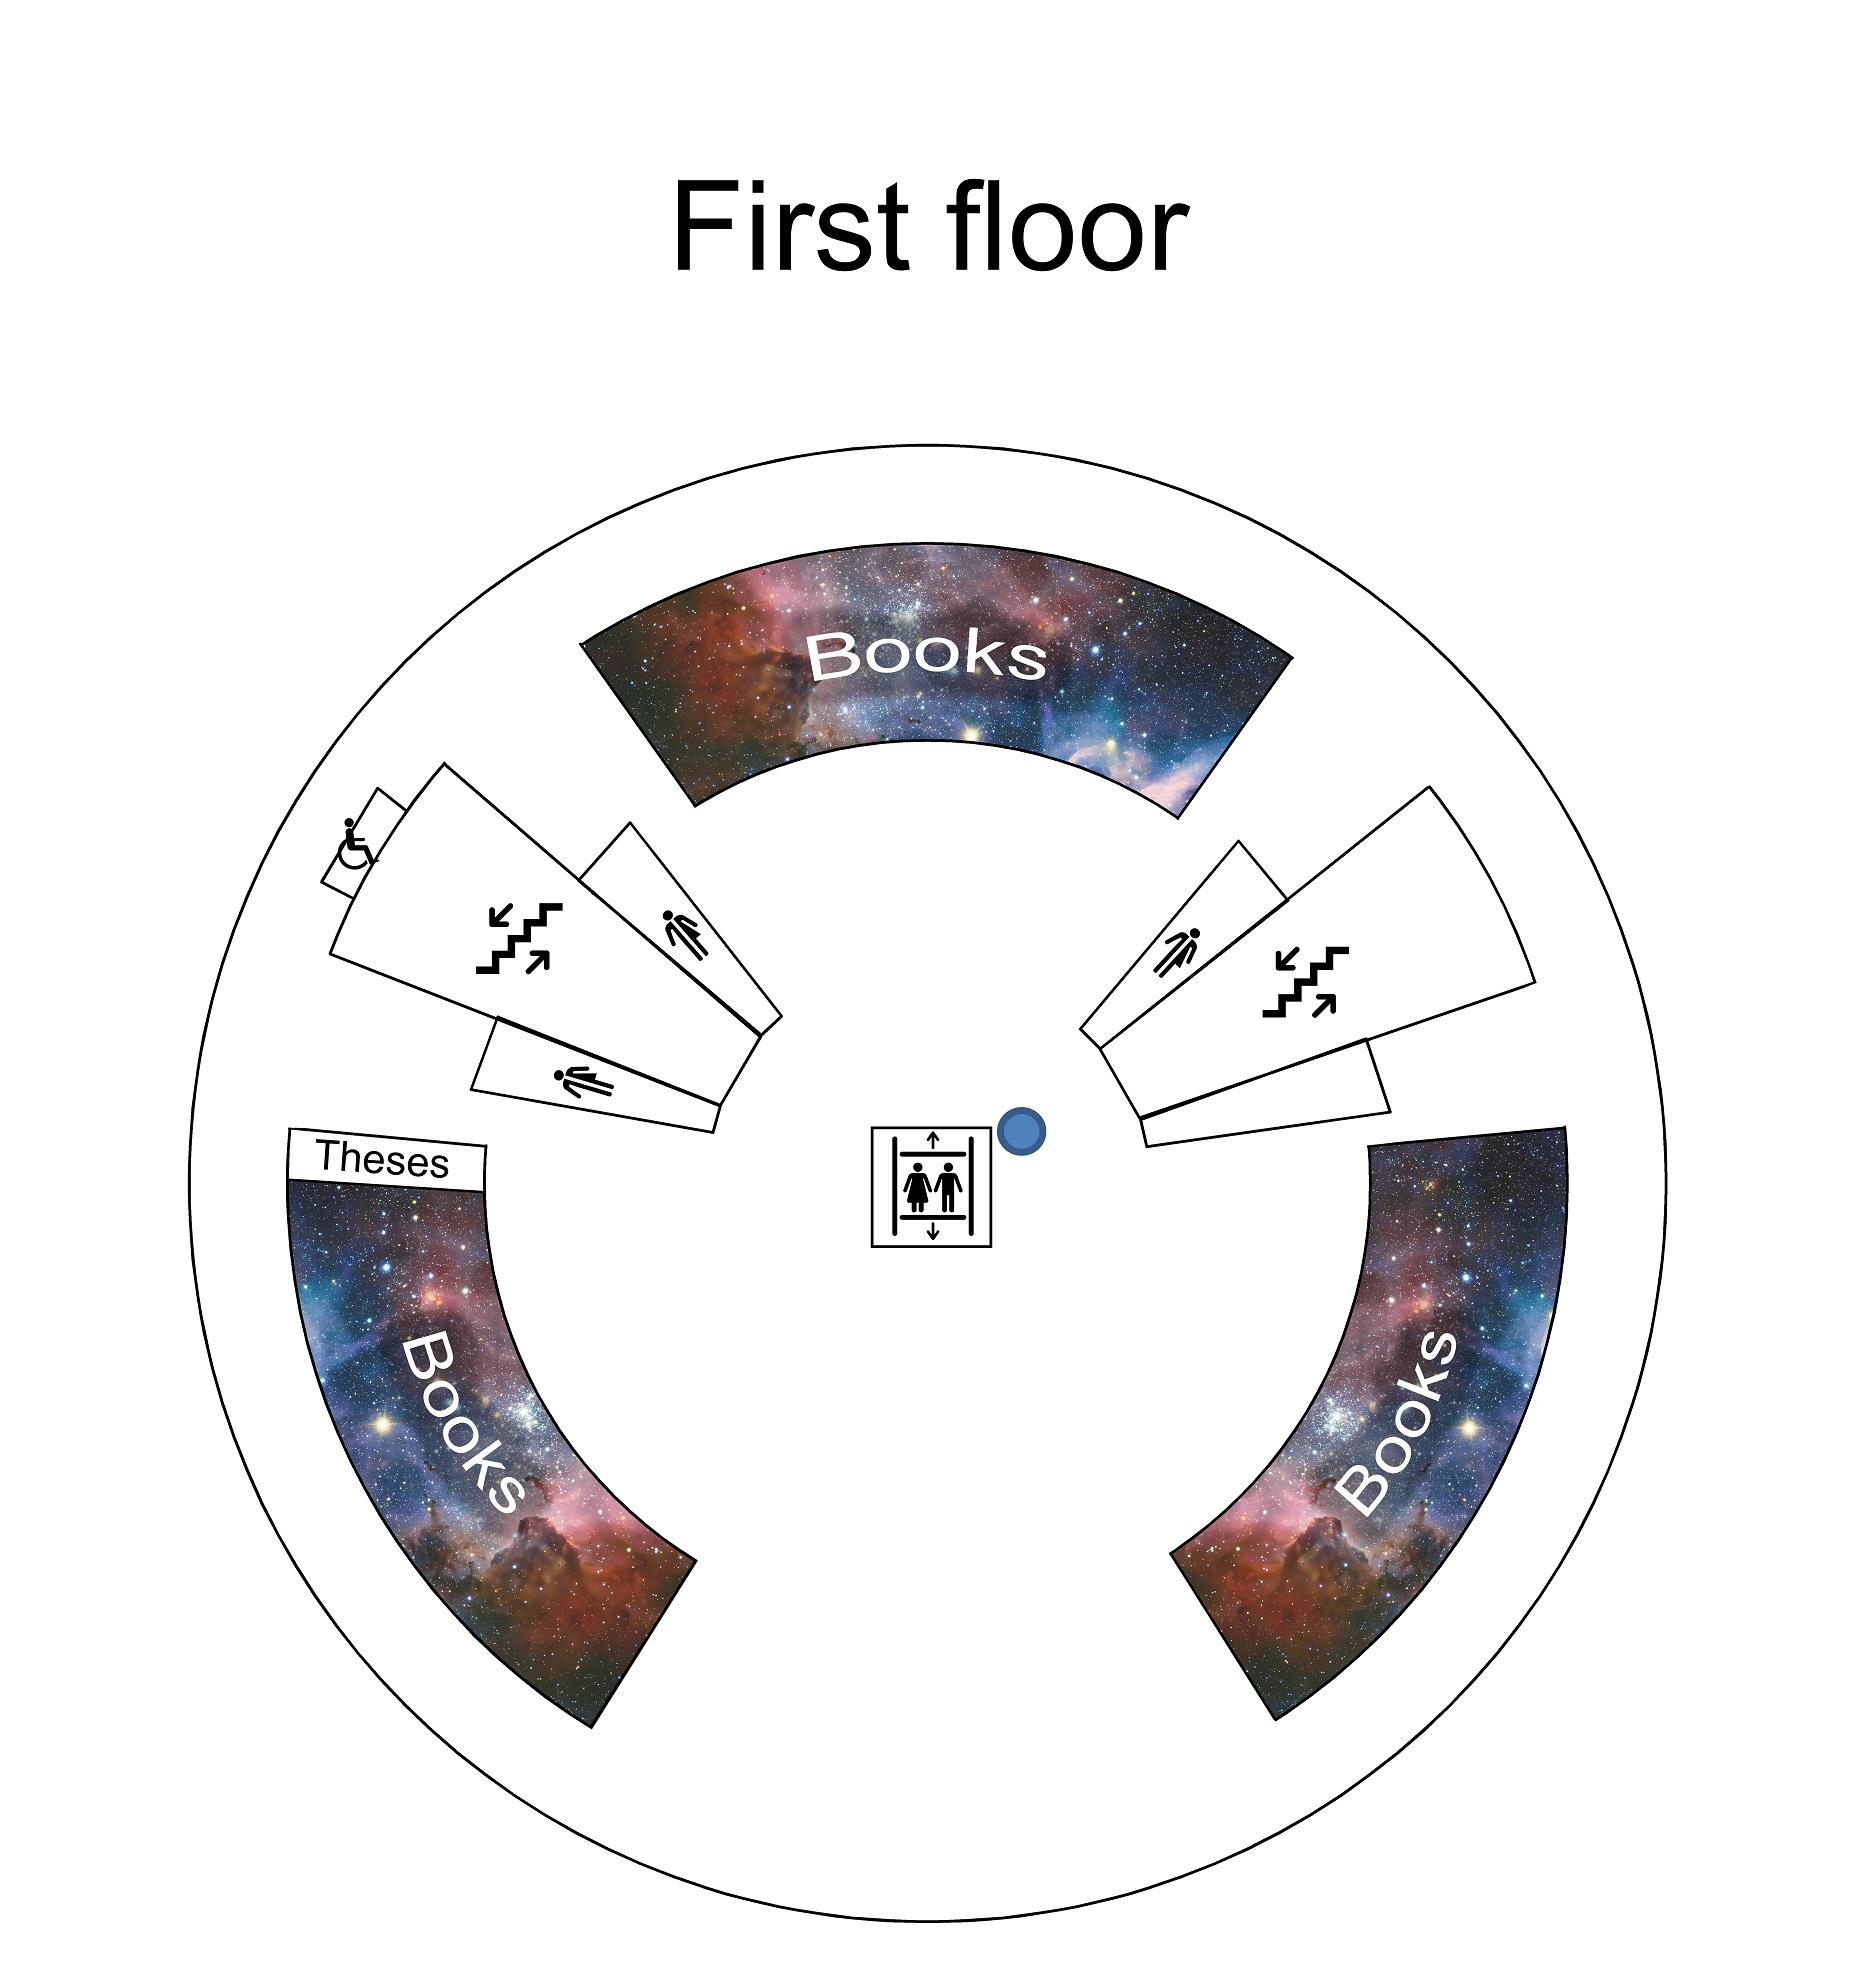 [IMAGE = 1st Floor]